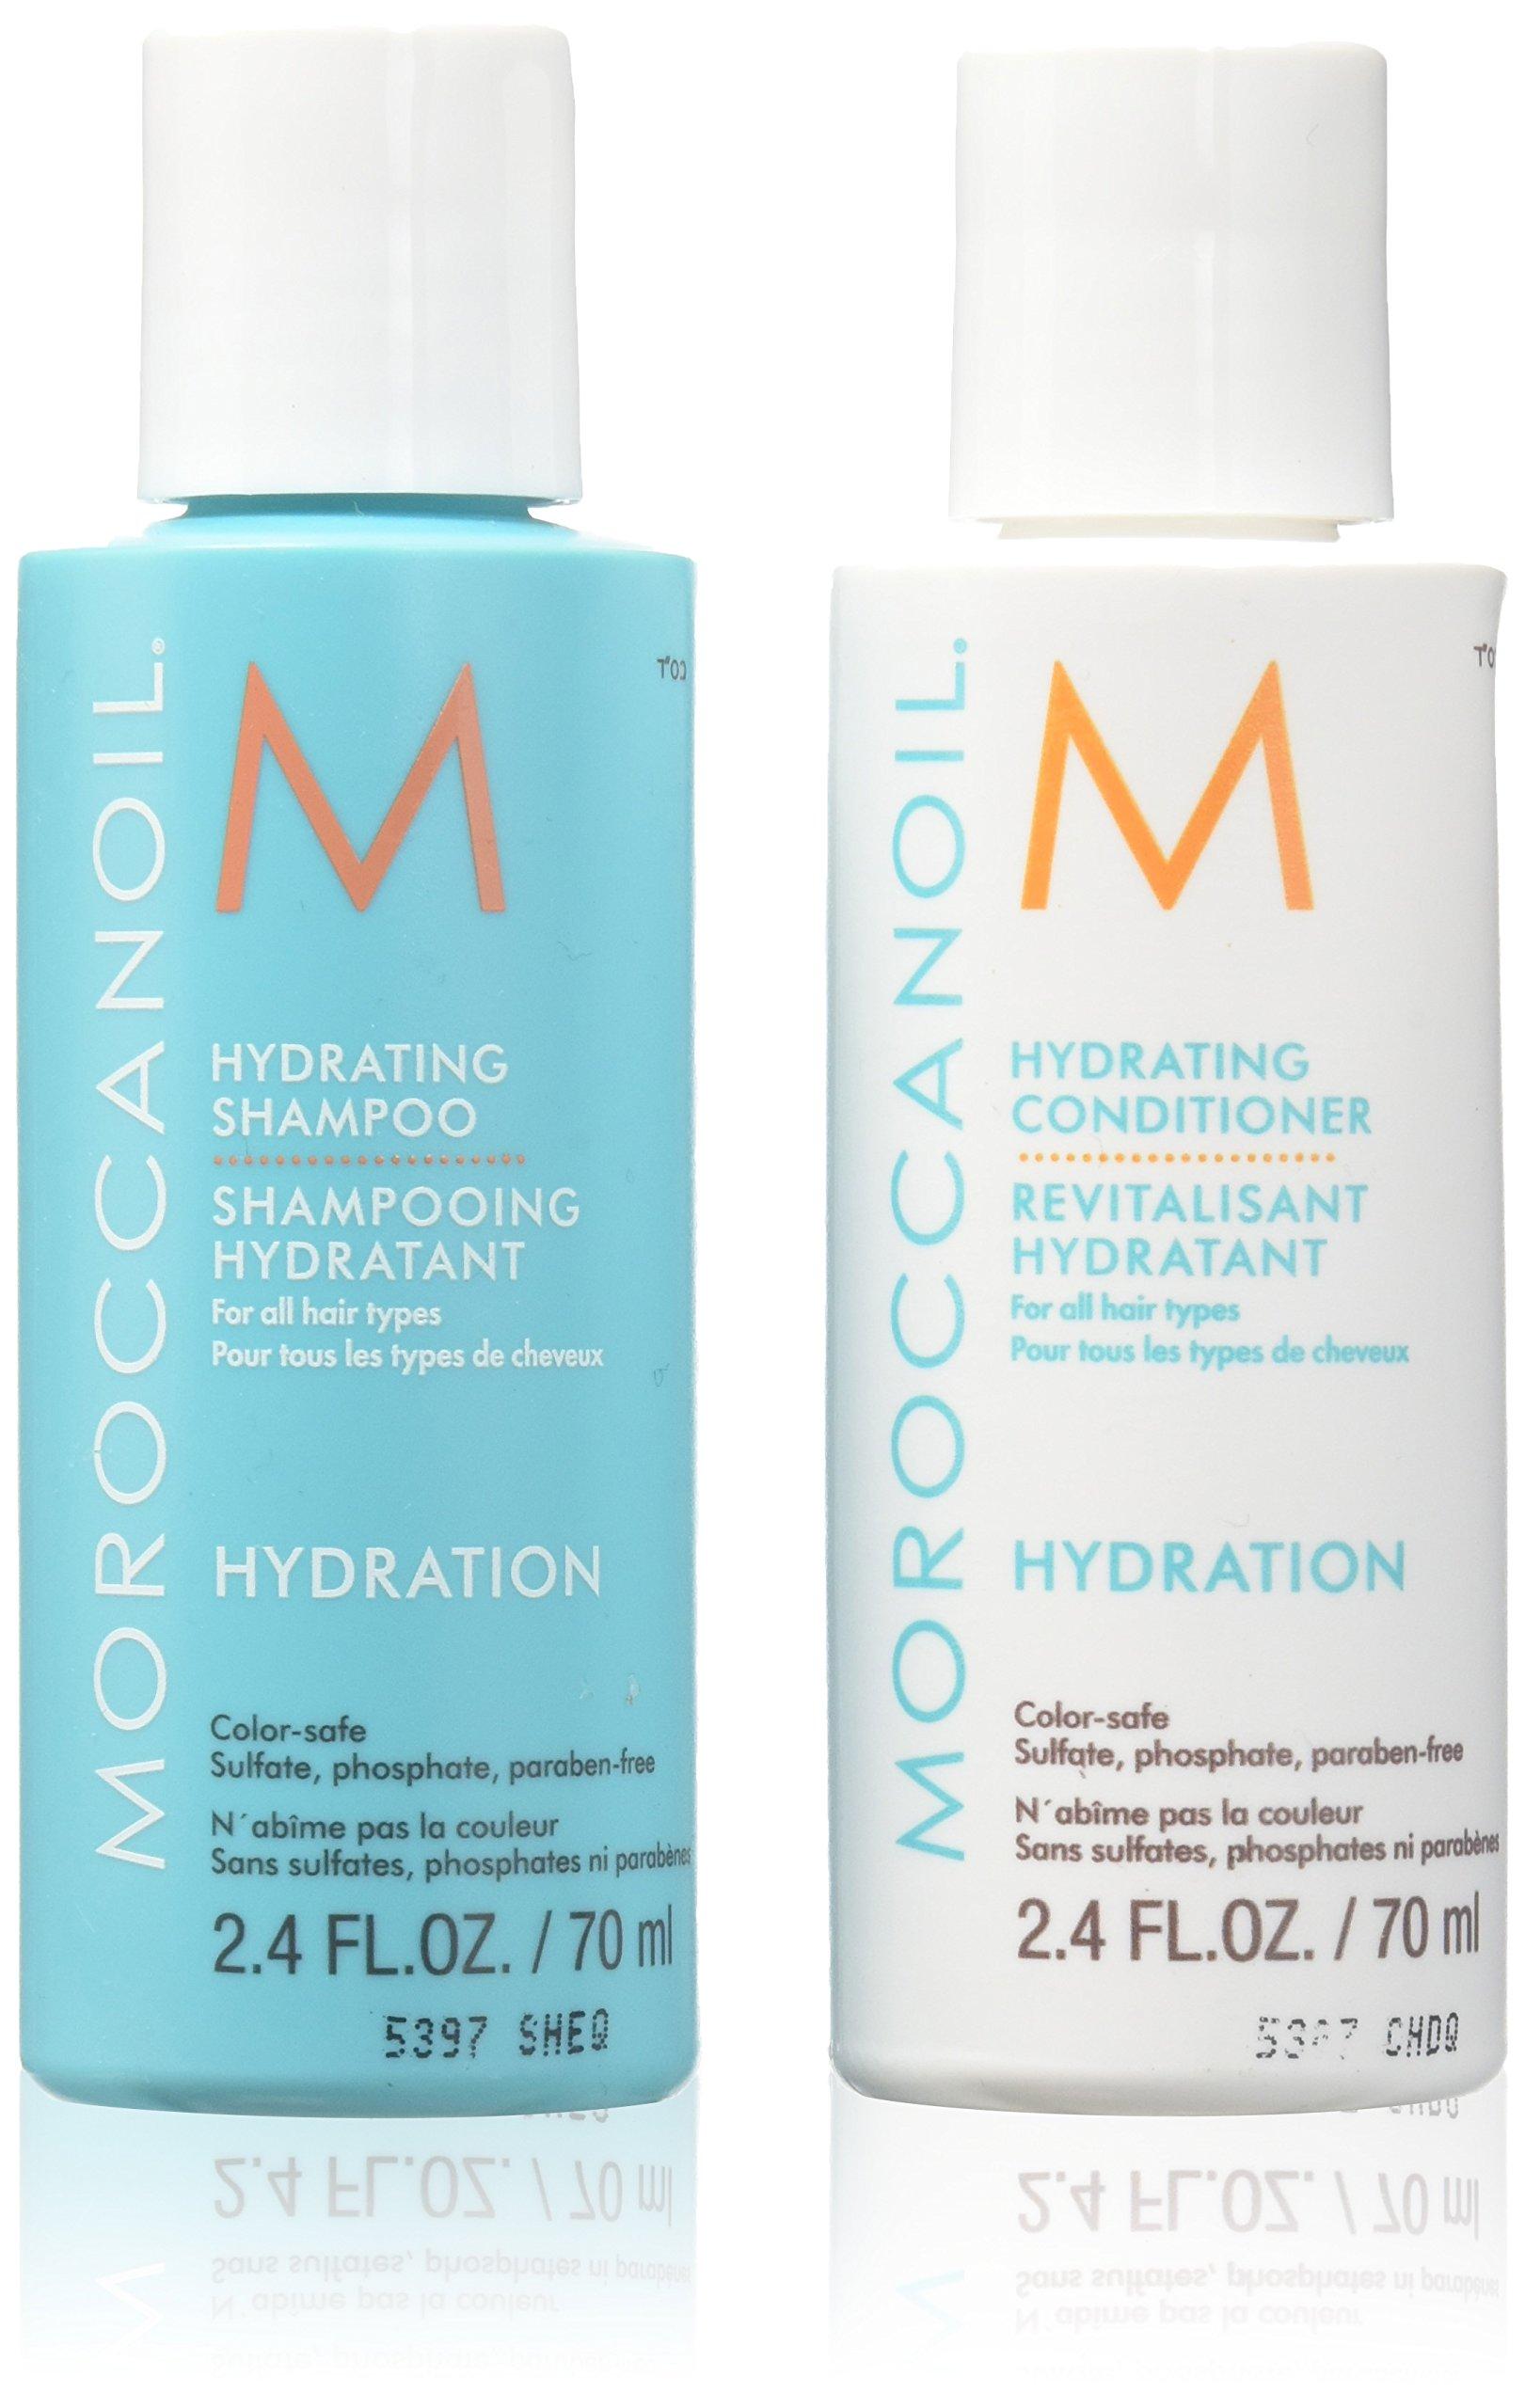 Moroccanoil Moisture Repair Shampoo & Conditioner Travel Set 2.4 oz each